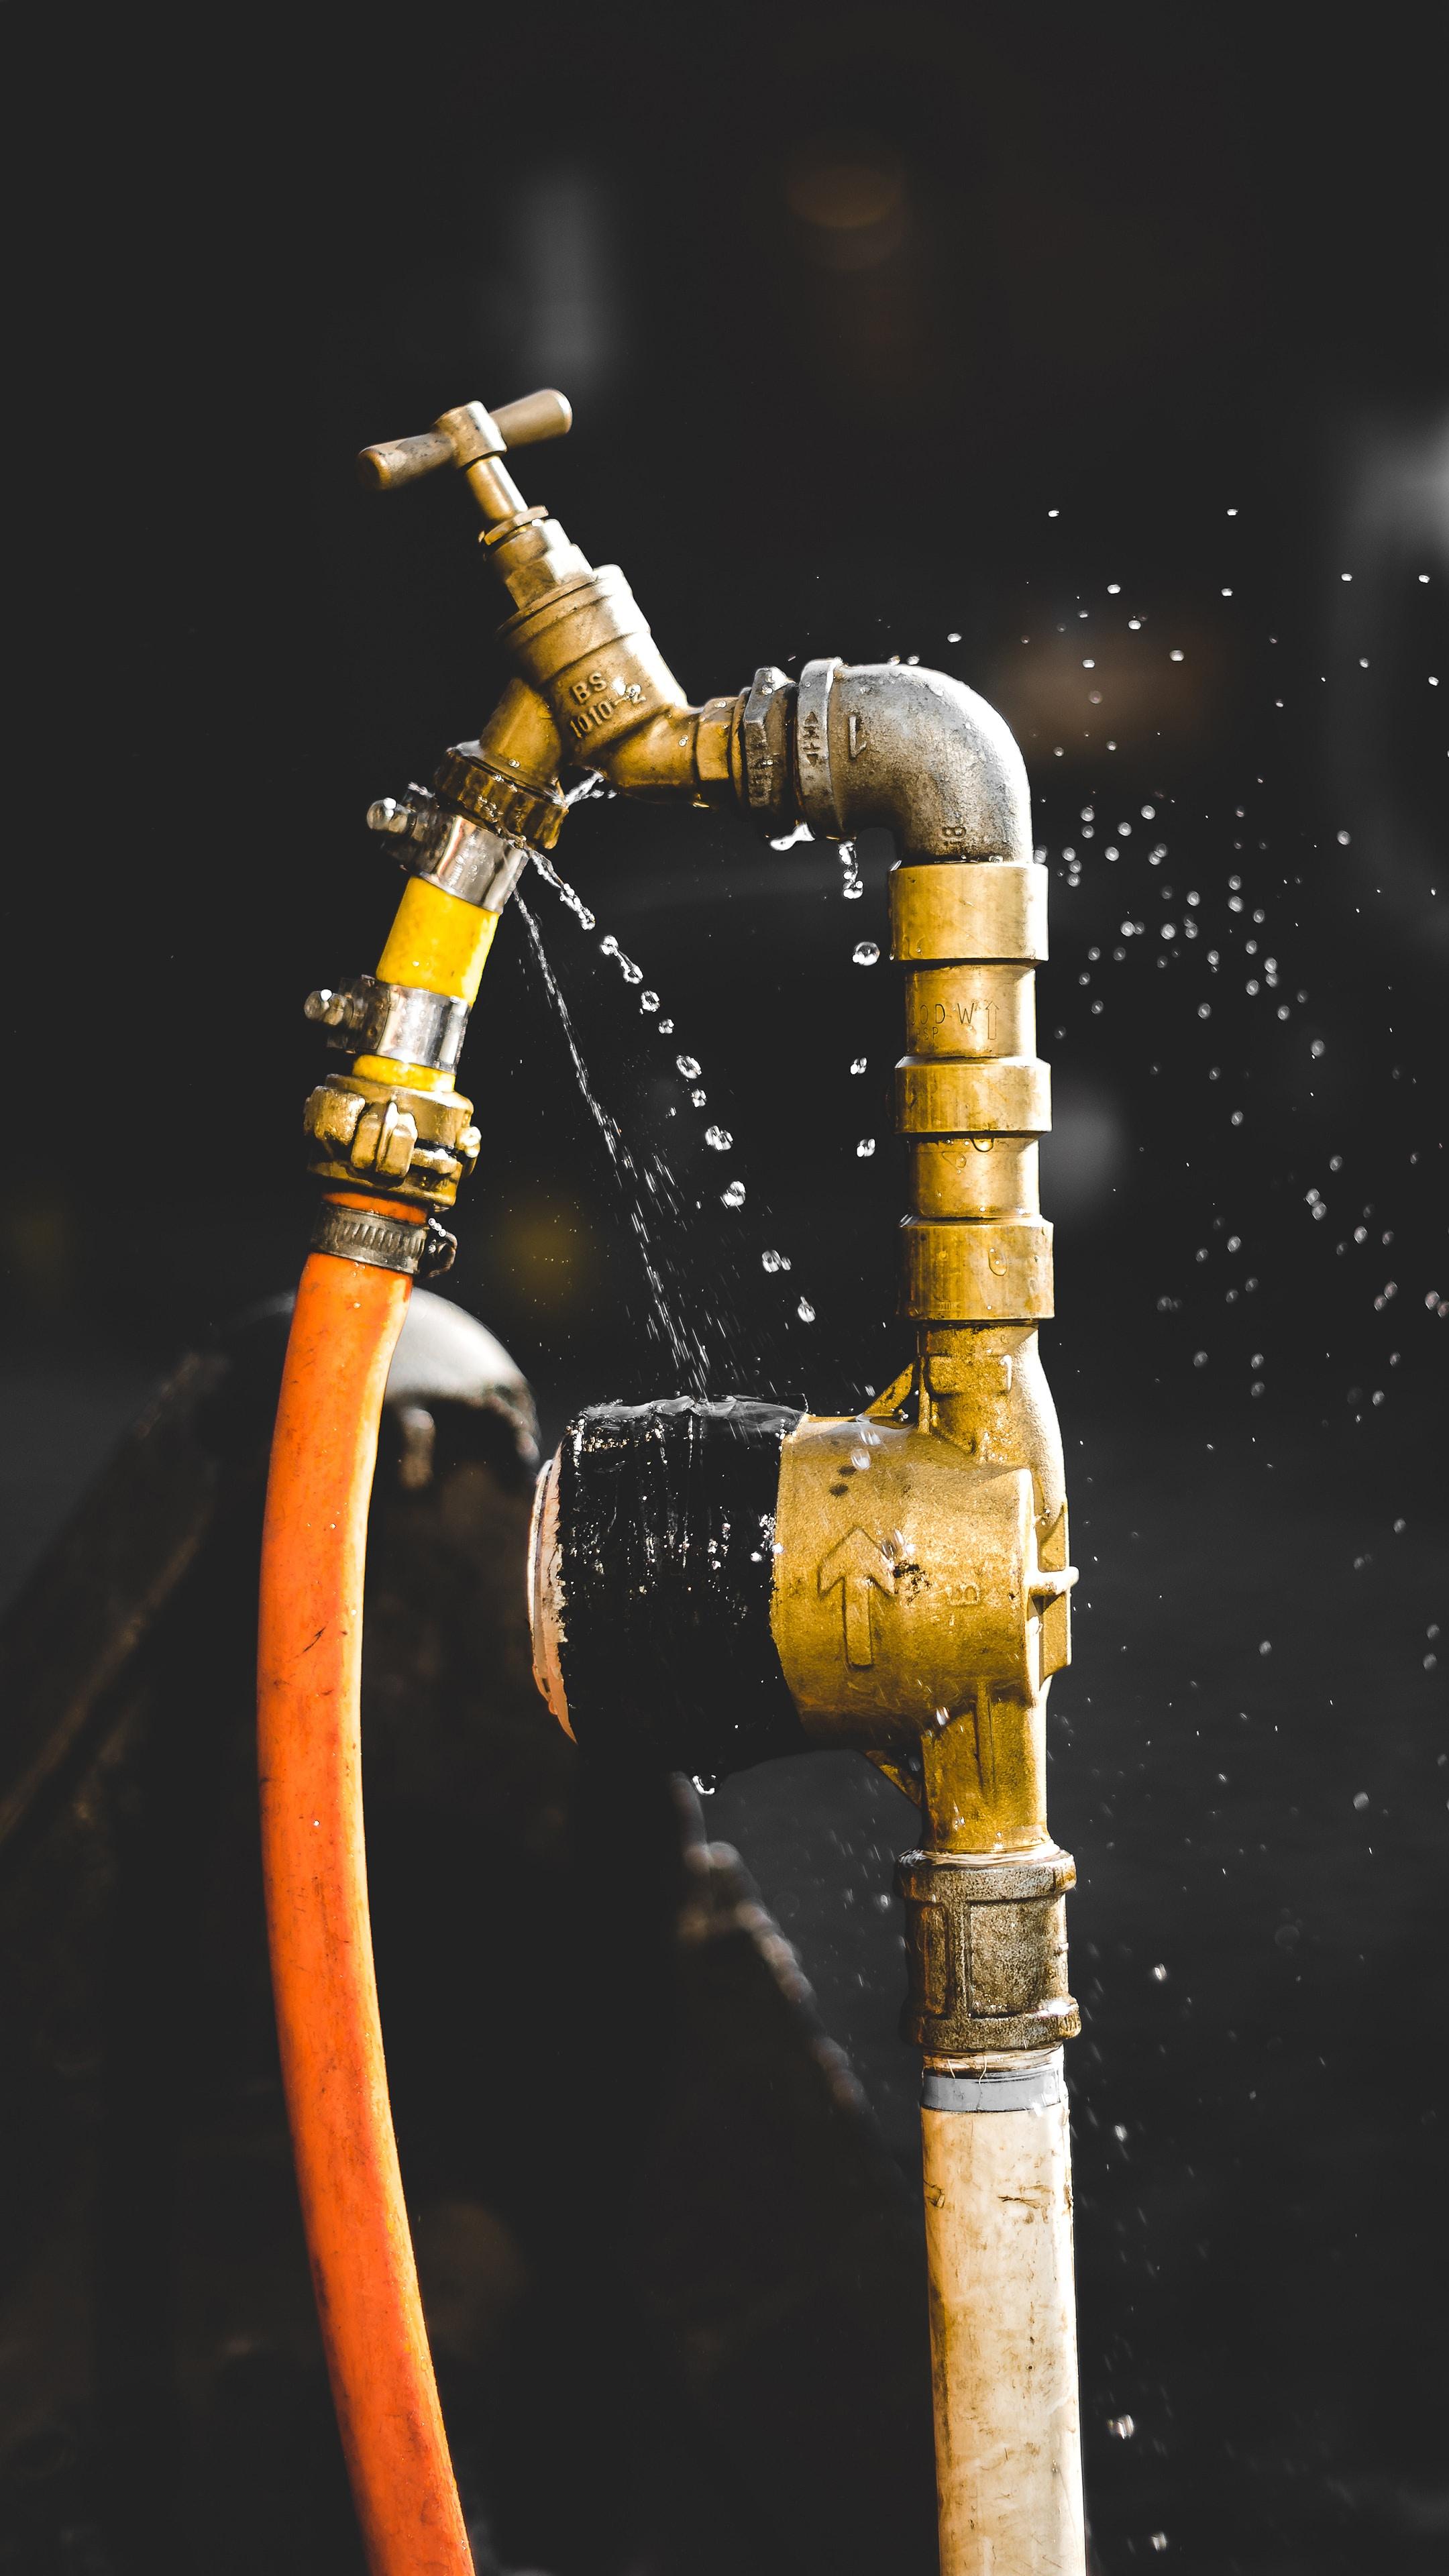 Show Me The Plumbing